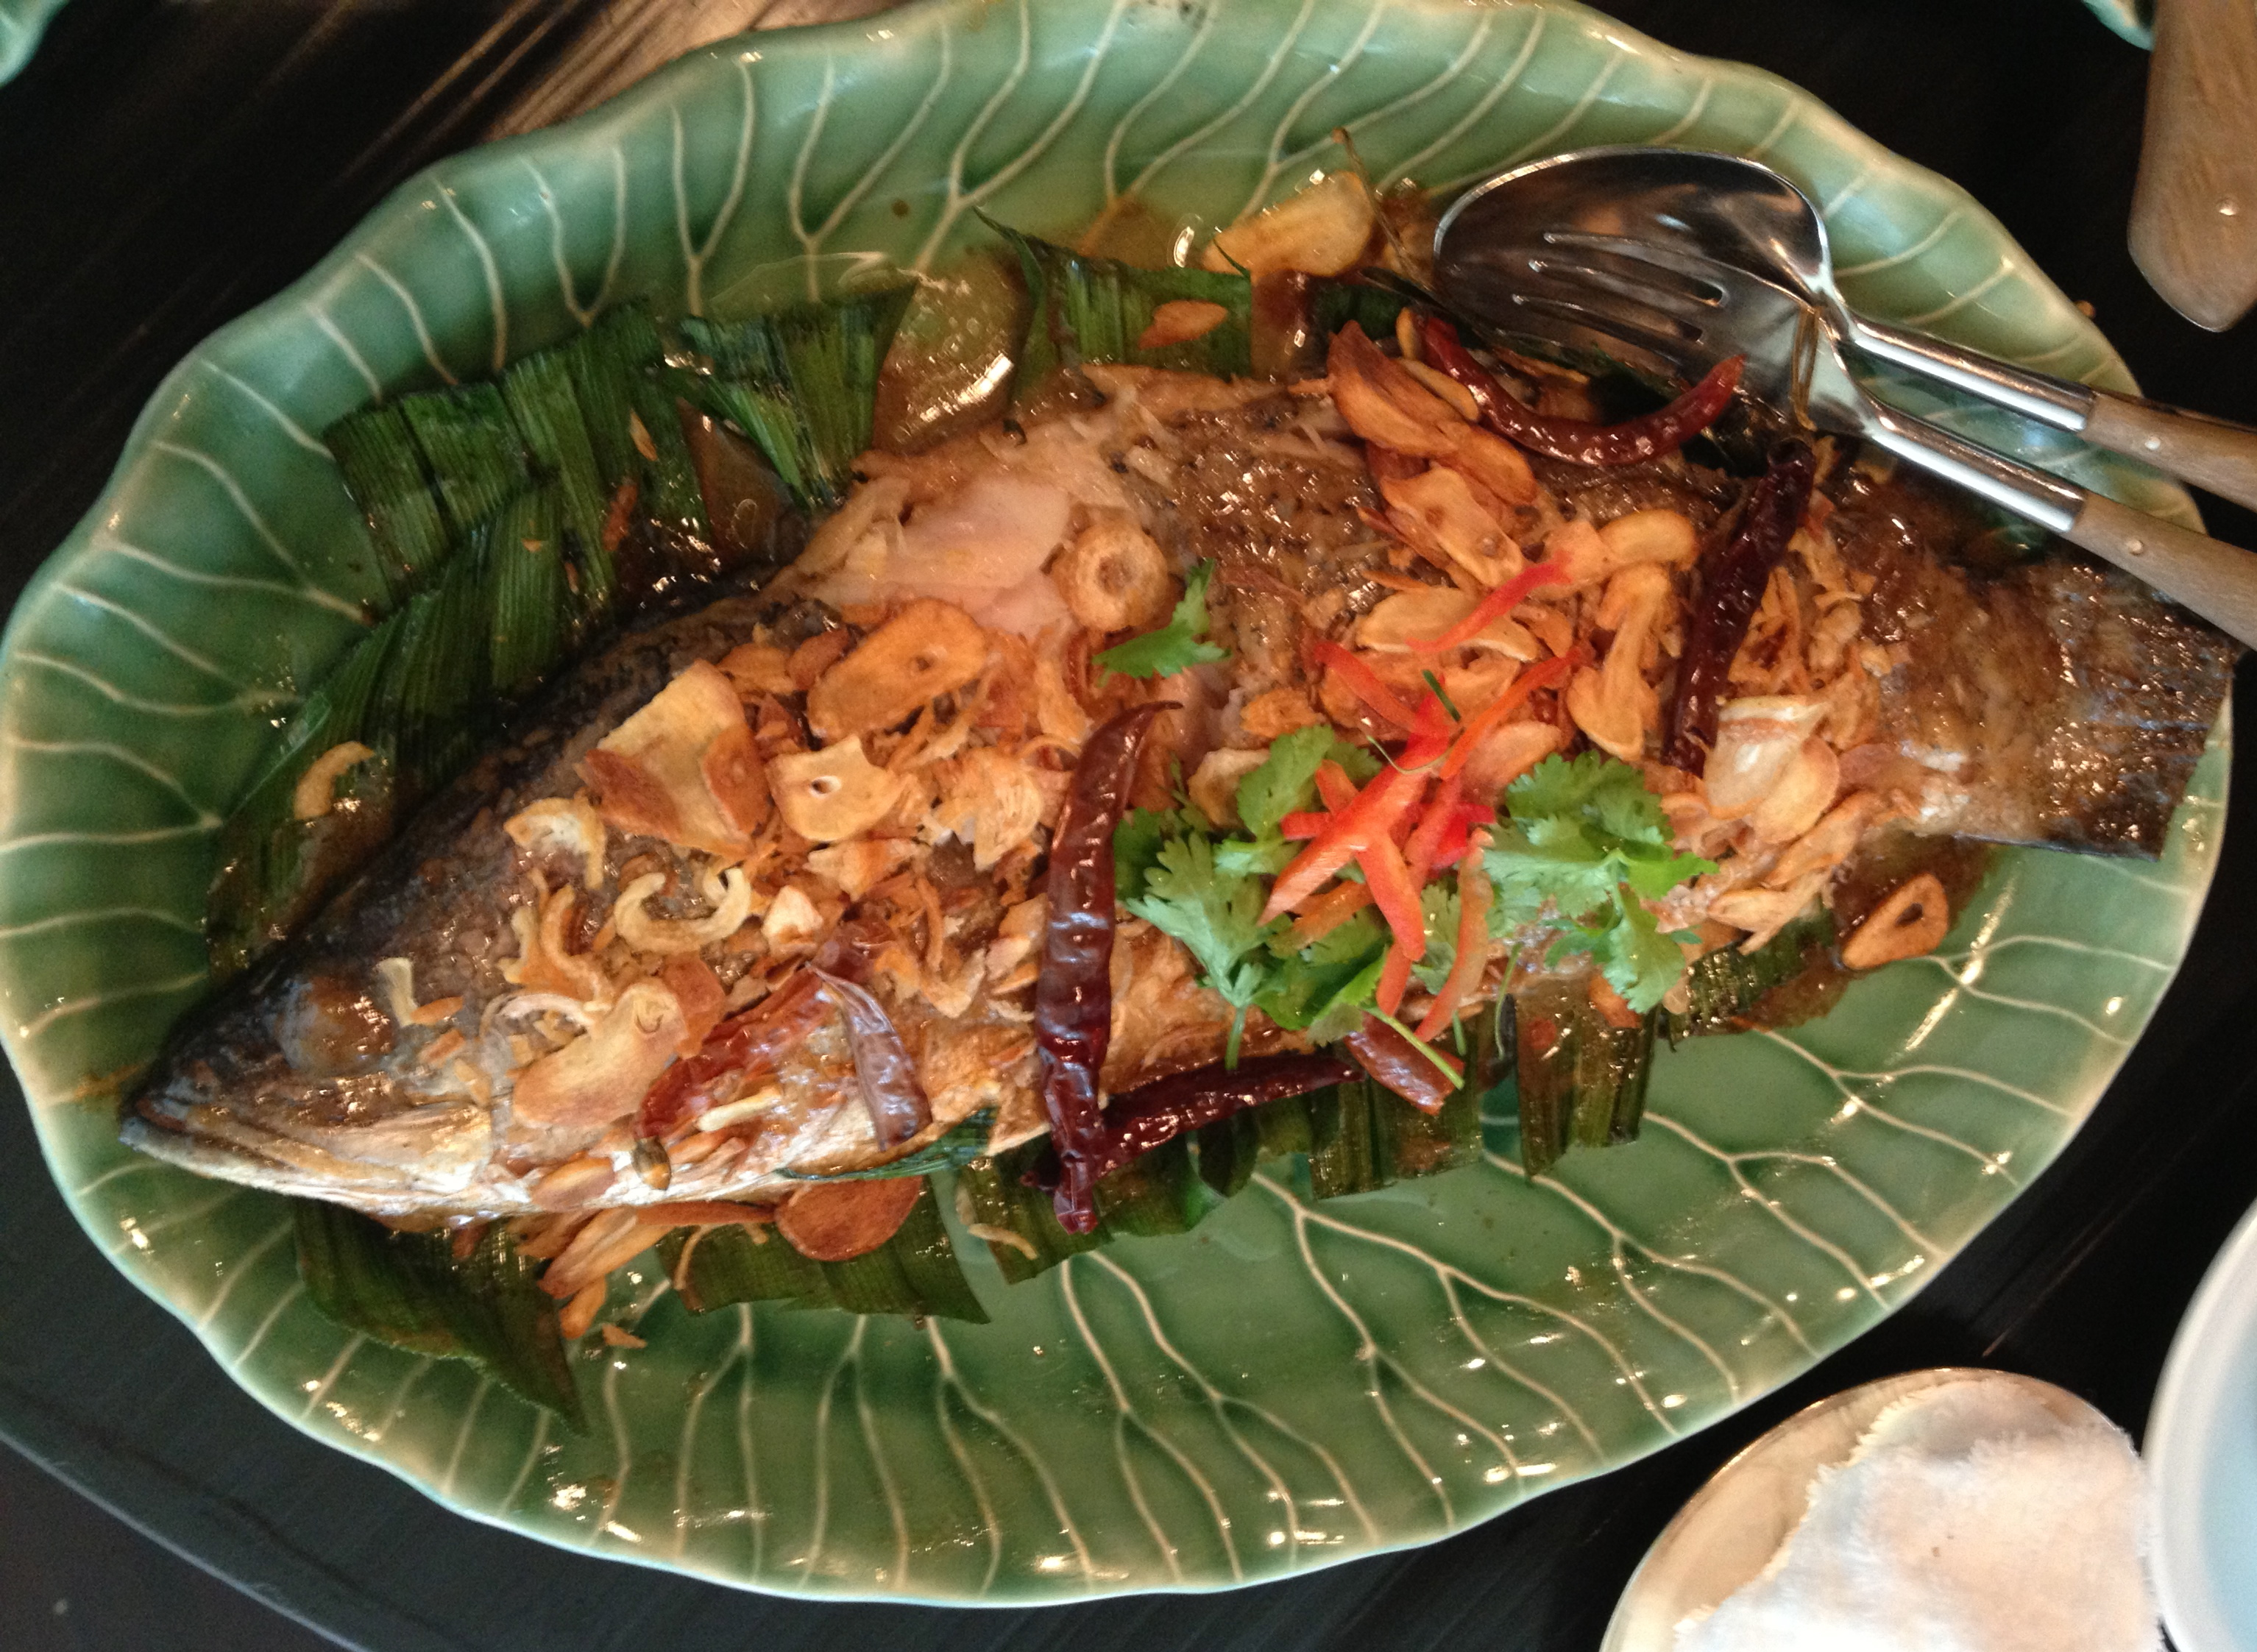 Spicy stir fried fish